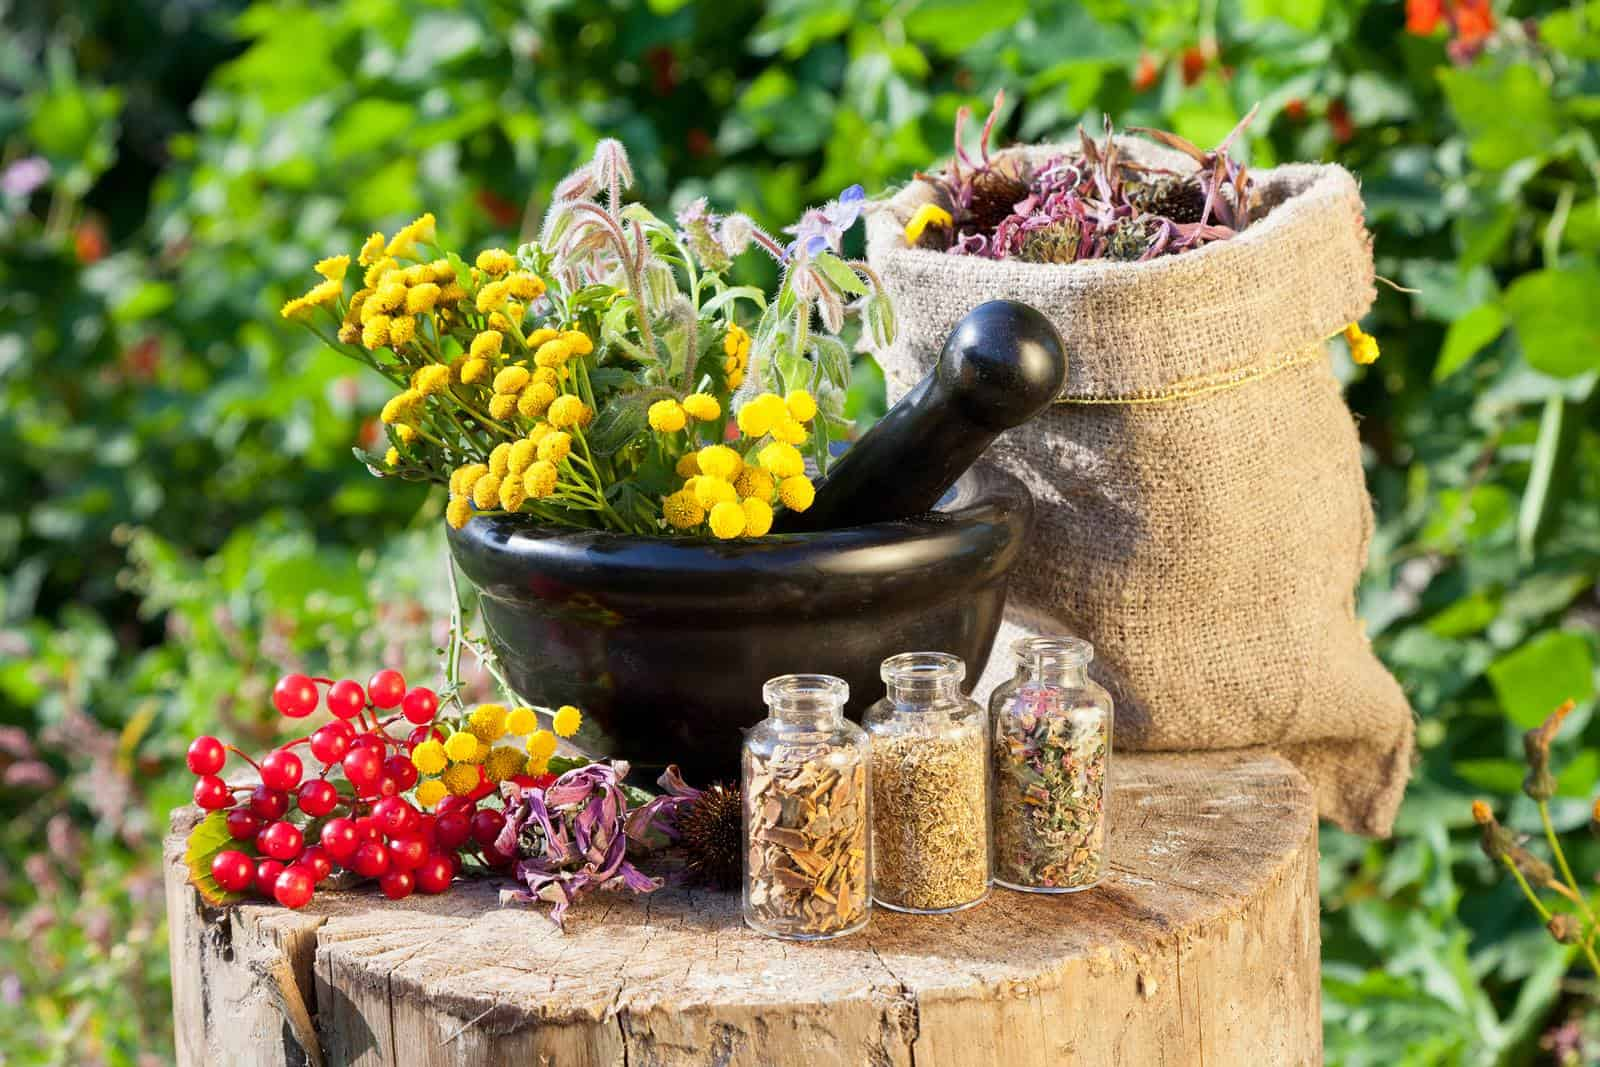 Лекарственные травы и цветы